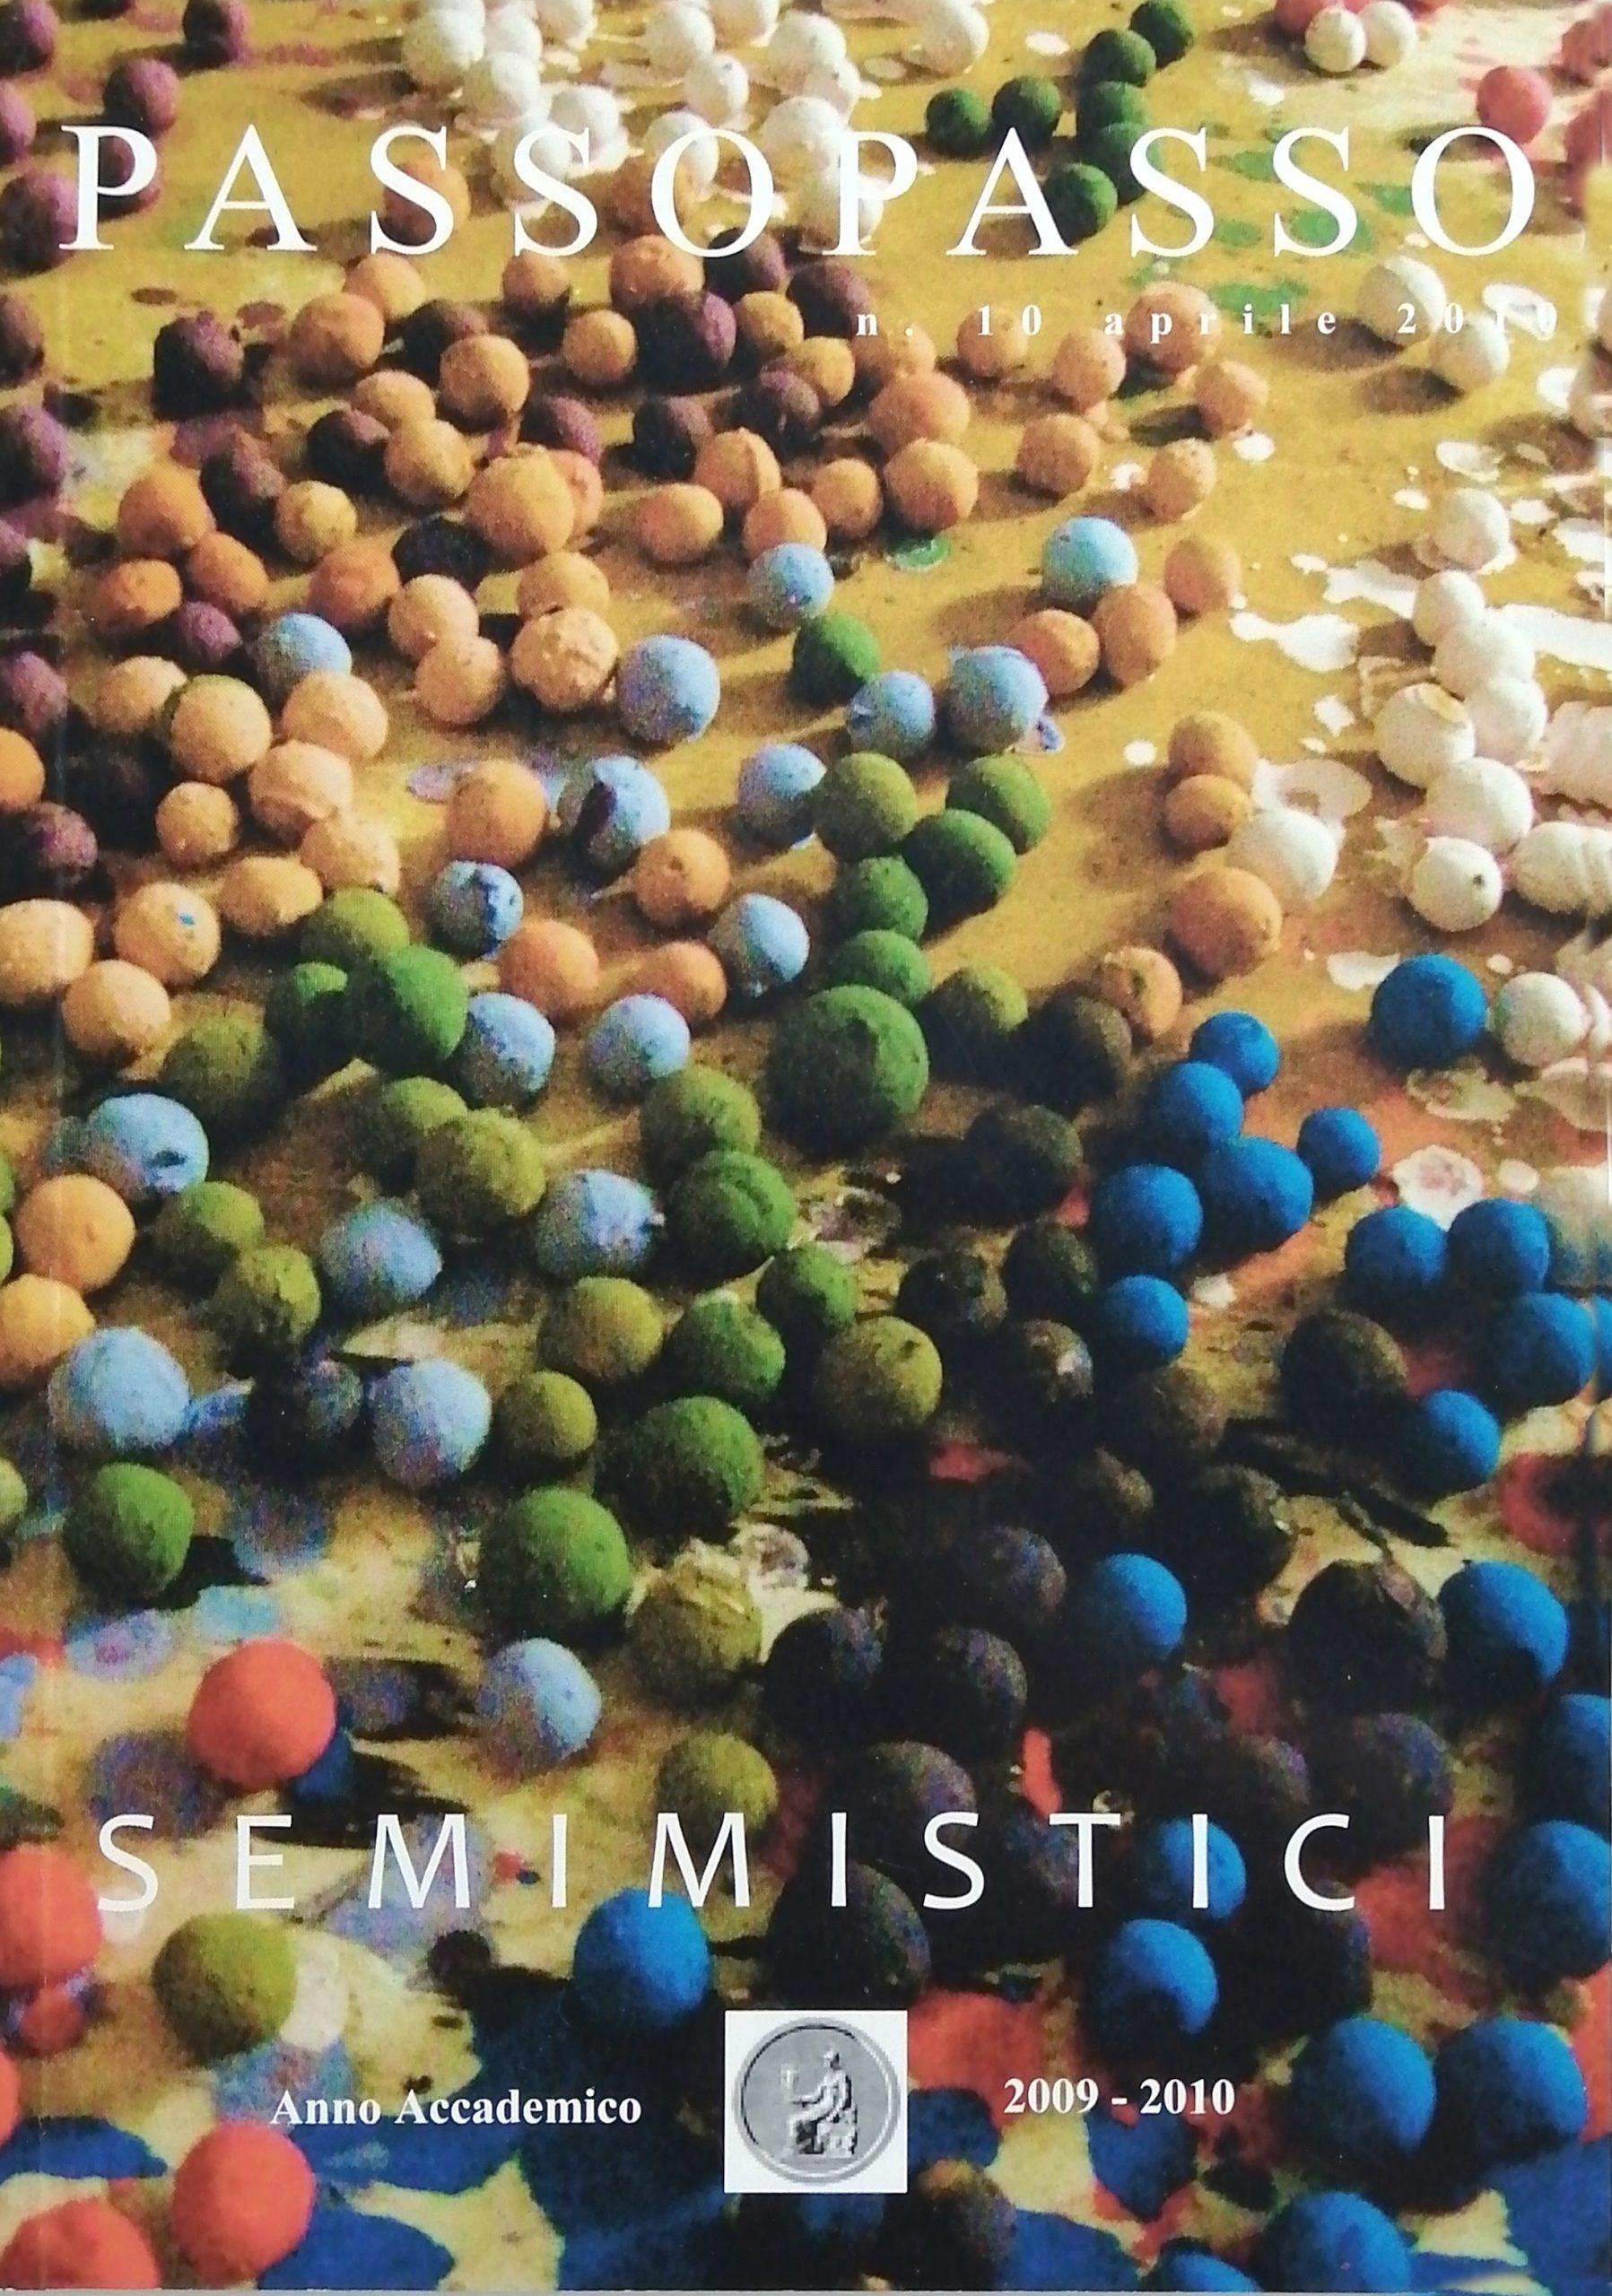 2010 Passopasso 10 rivista catalogo scaled - Bibliography/ Catalogues